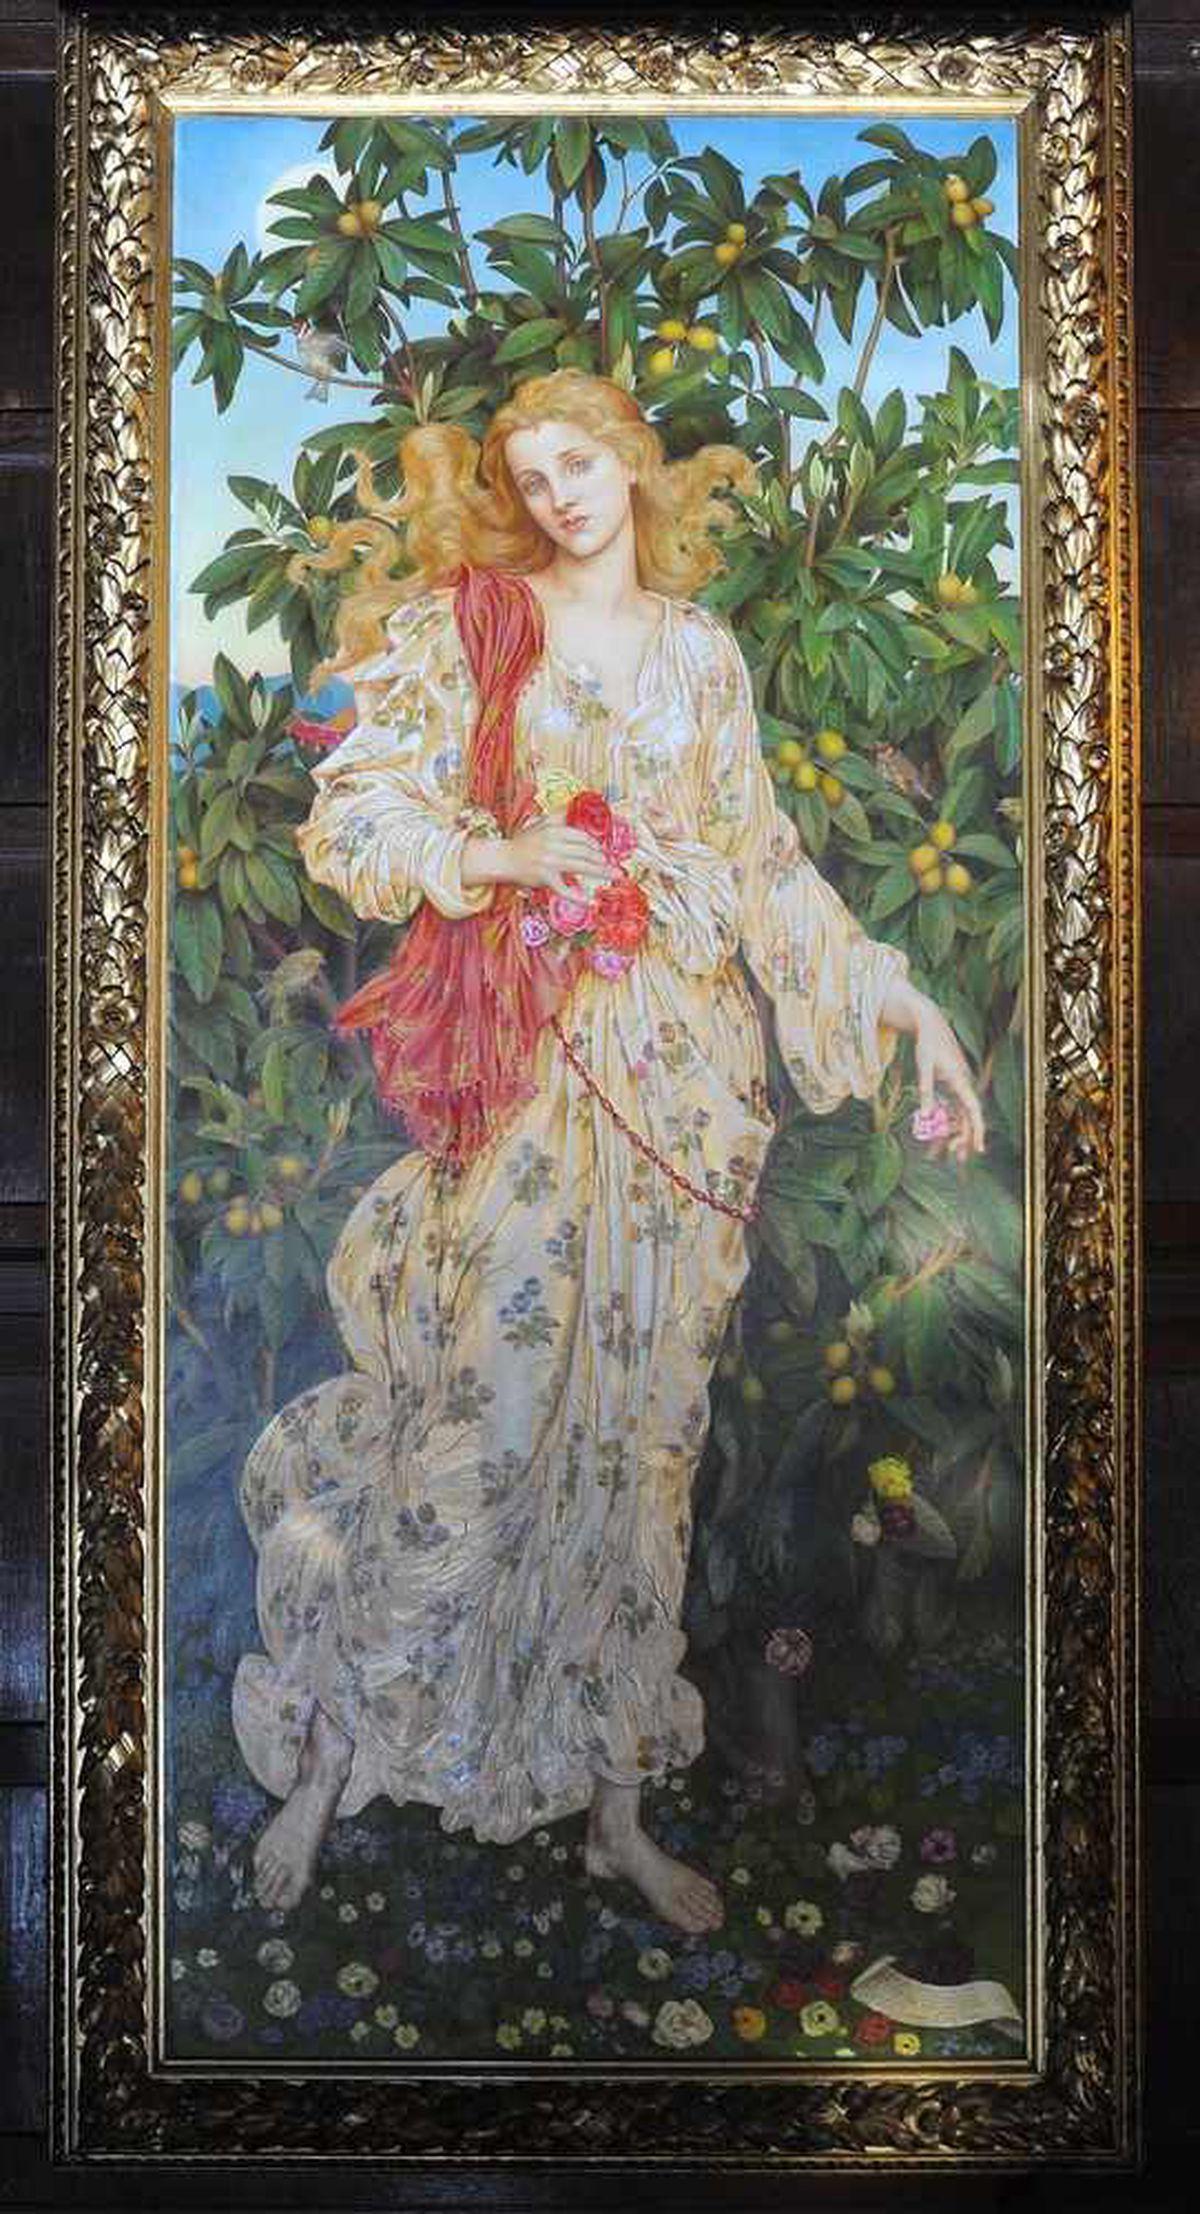 Pre-Raphaelite artwork on loan to Wightwick Manor